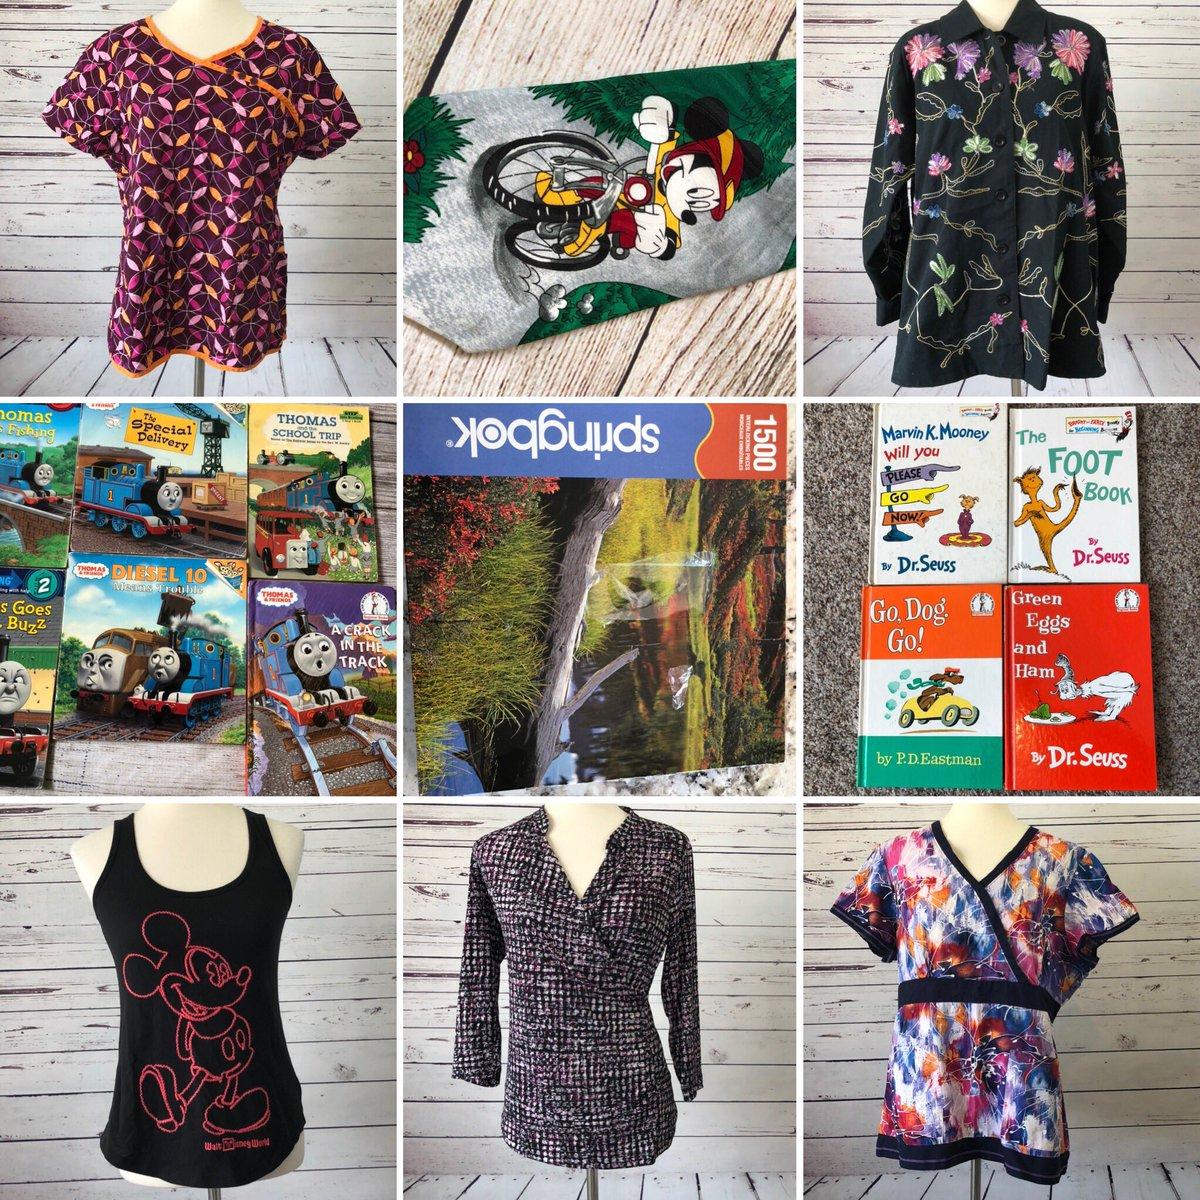 ✨new listings✨ make an offer on @ebay👇🏻 . https://t.co/4rQ8umqGd6 . #HowToSpendYourStimulus #goodwillfind #thriftshop #ShopMyCloset @disney #puzzles #SmallBusiness #drseuss @poshmark #disney #books https://t.co/z7kD27xzMe